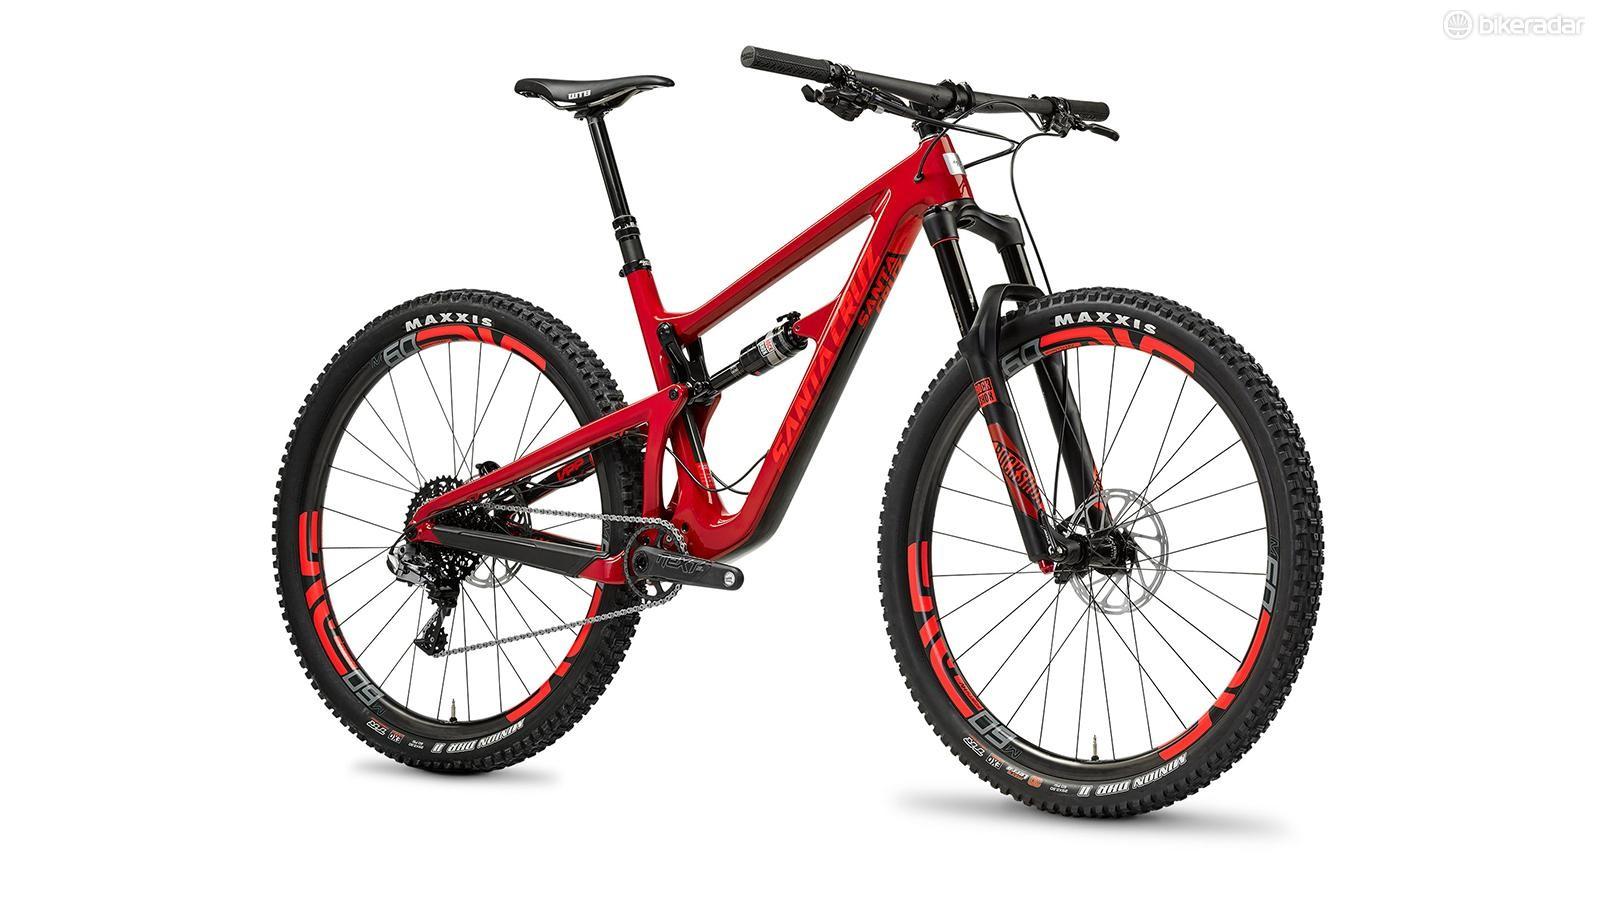 This year's most wanted trail bike: the Santa Cruz Hightower